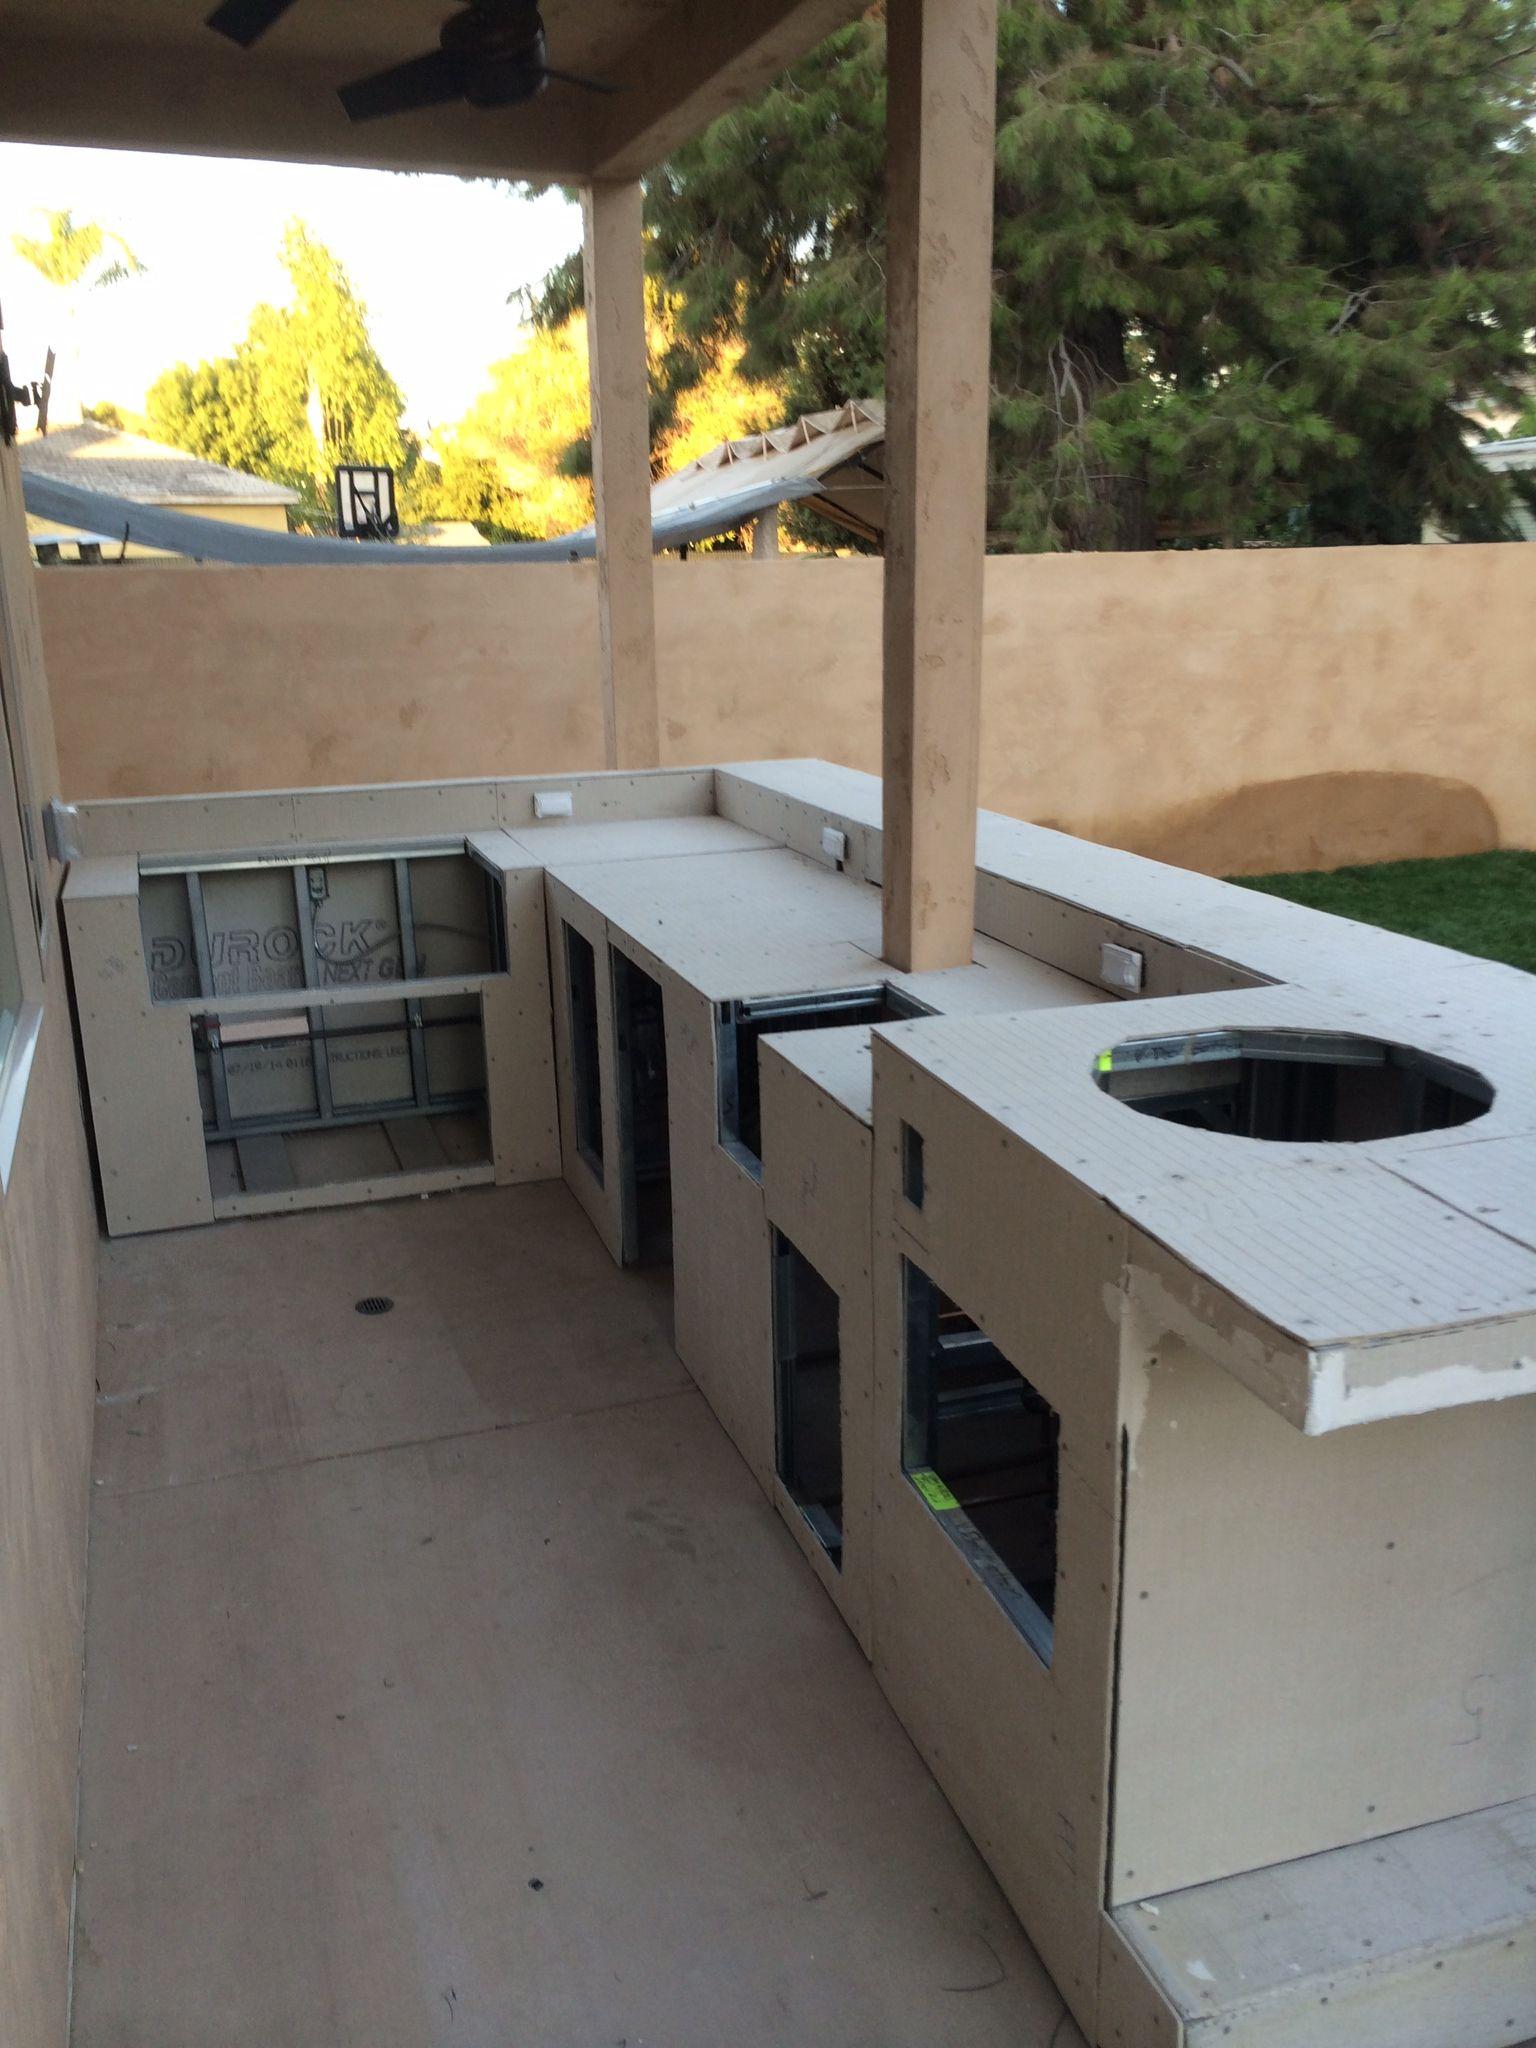 Miles yokota pic gardens pinterest kitchens